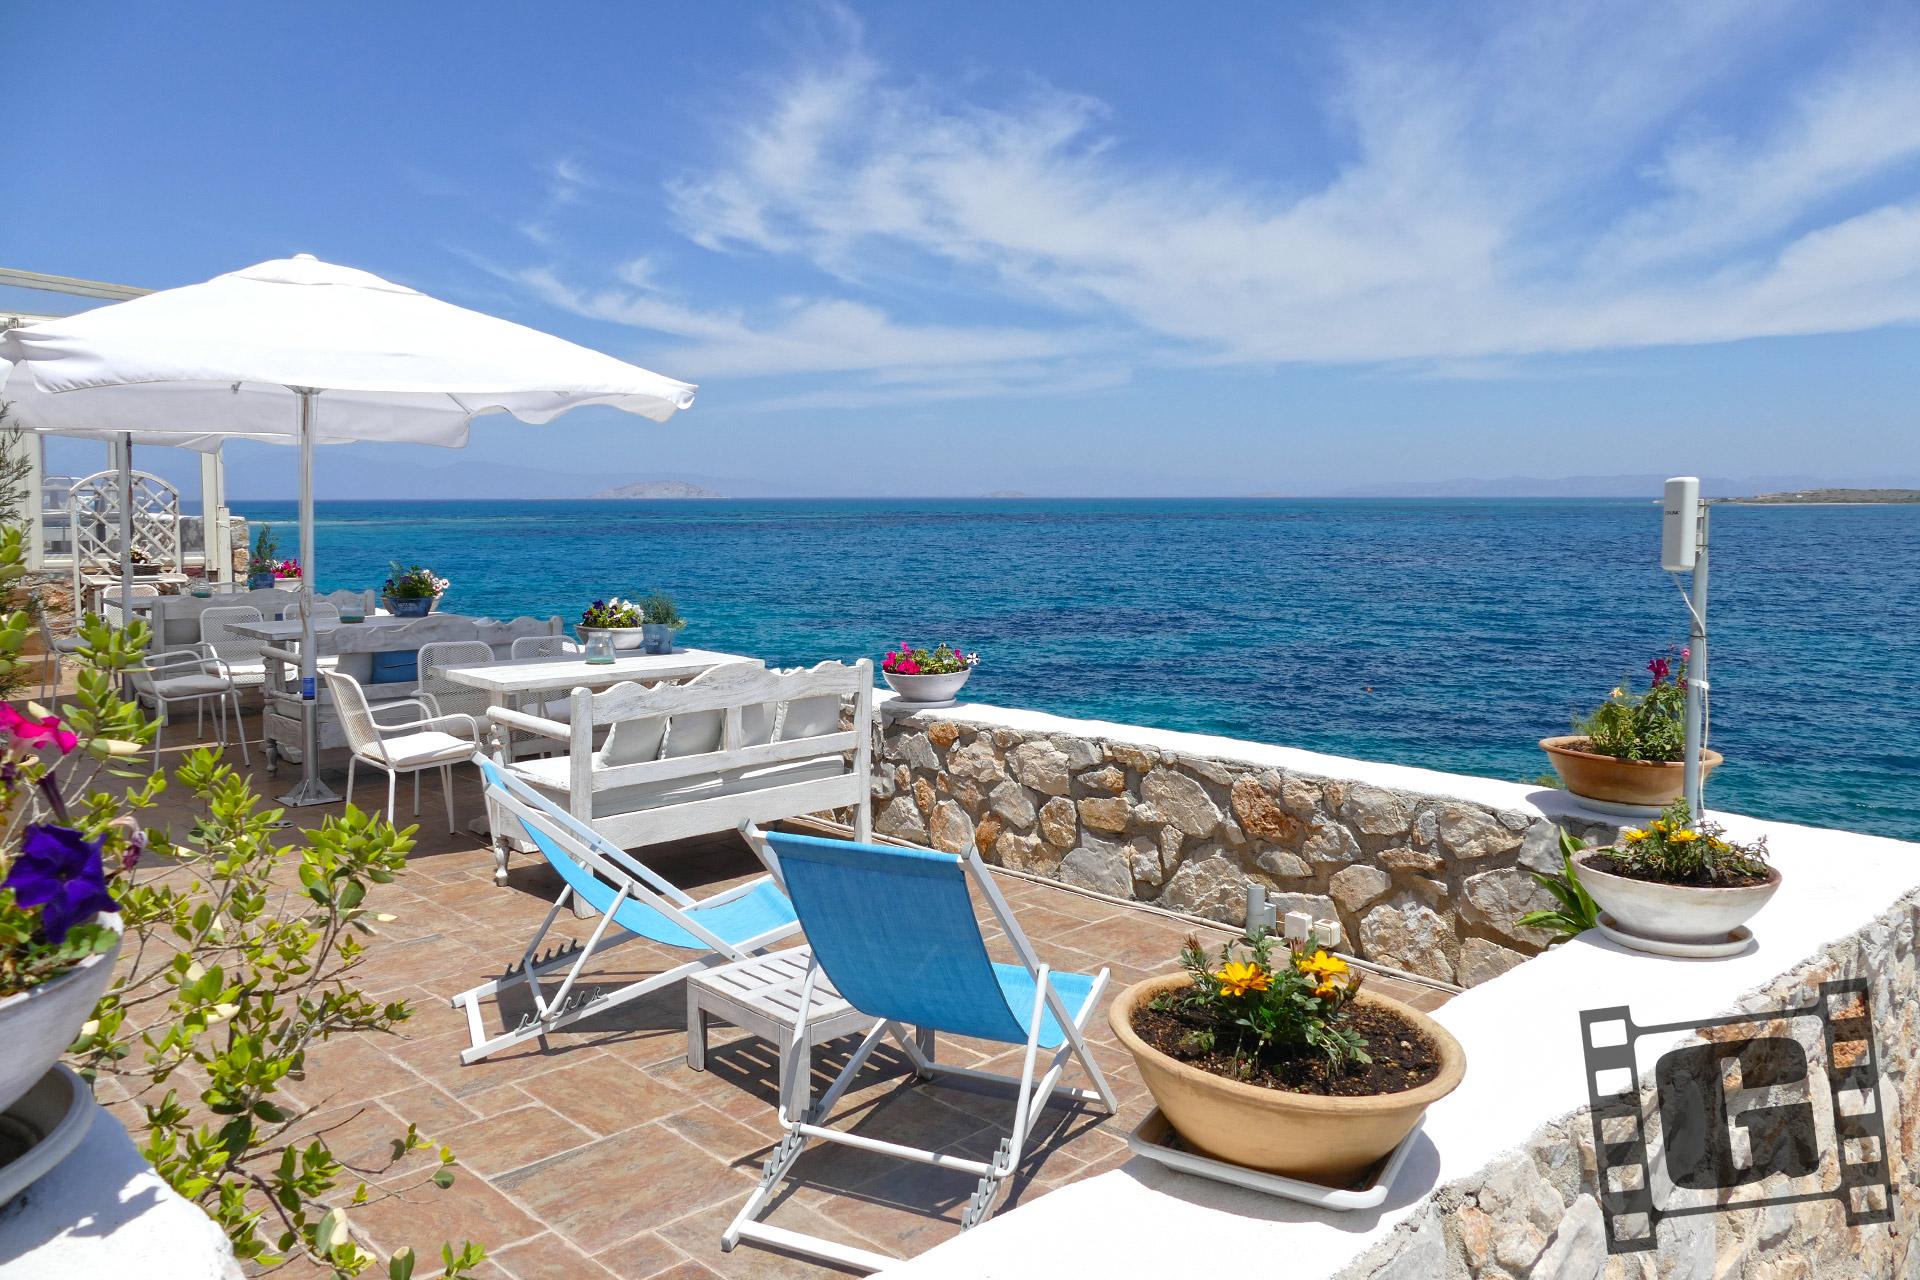 Hotel Kekrifalia, Agistri Island, Greece, Κεκρυφάλια, Αγκίστρι, Photos, Giatrakos